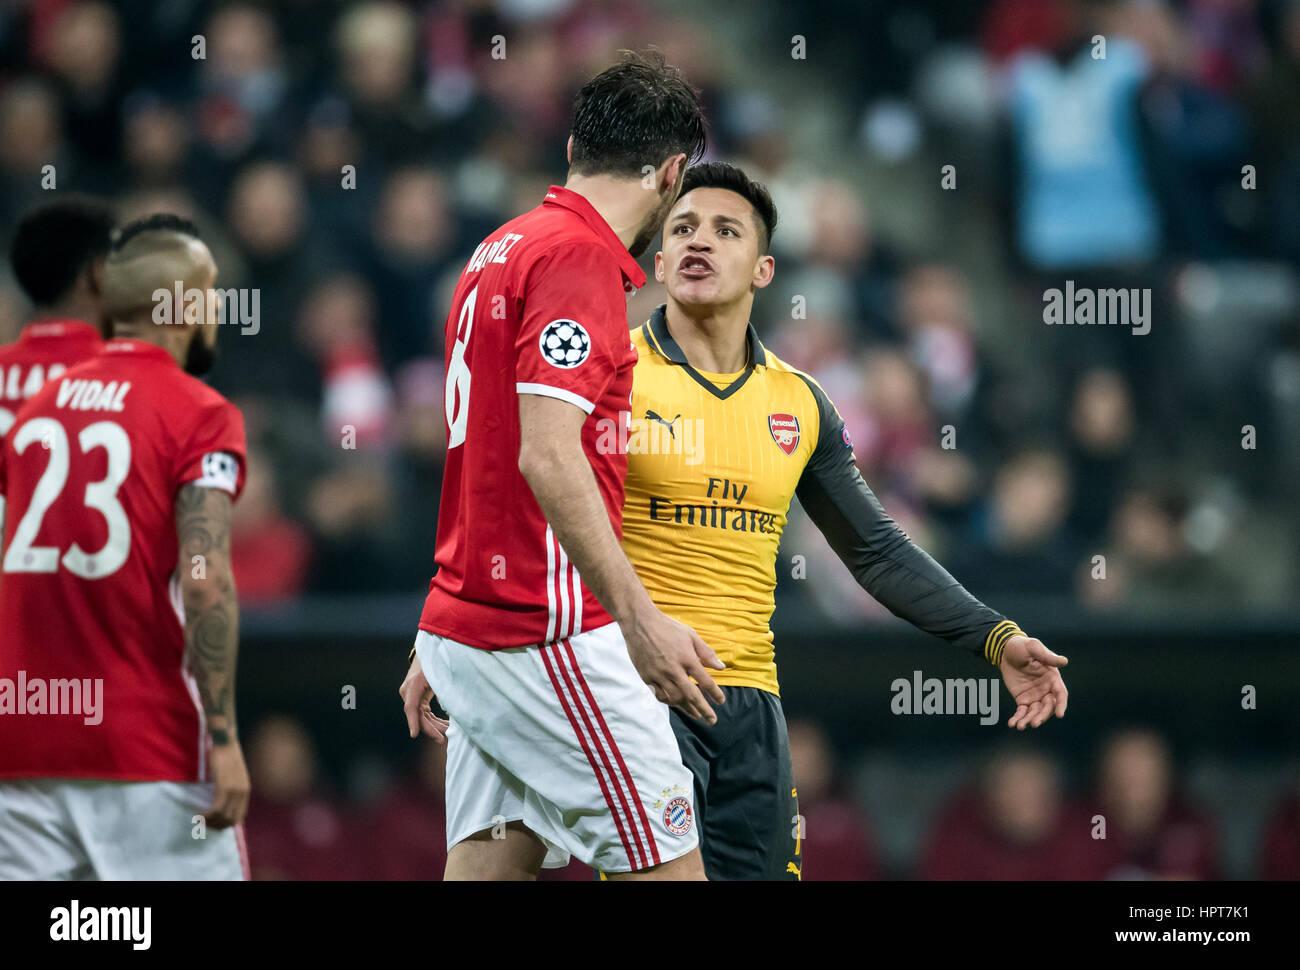 Munich Germany 15th Feb 2017 Munich s Javi Martinez red and